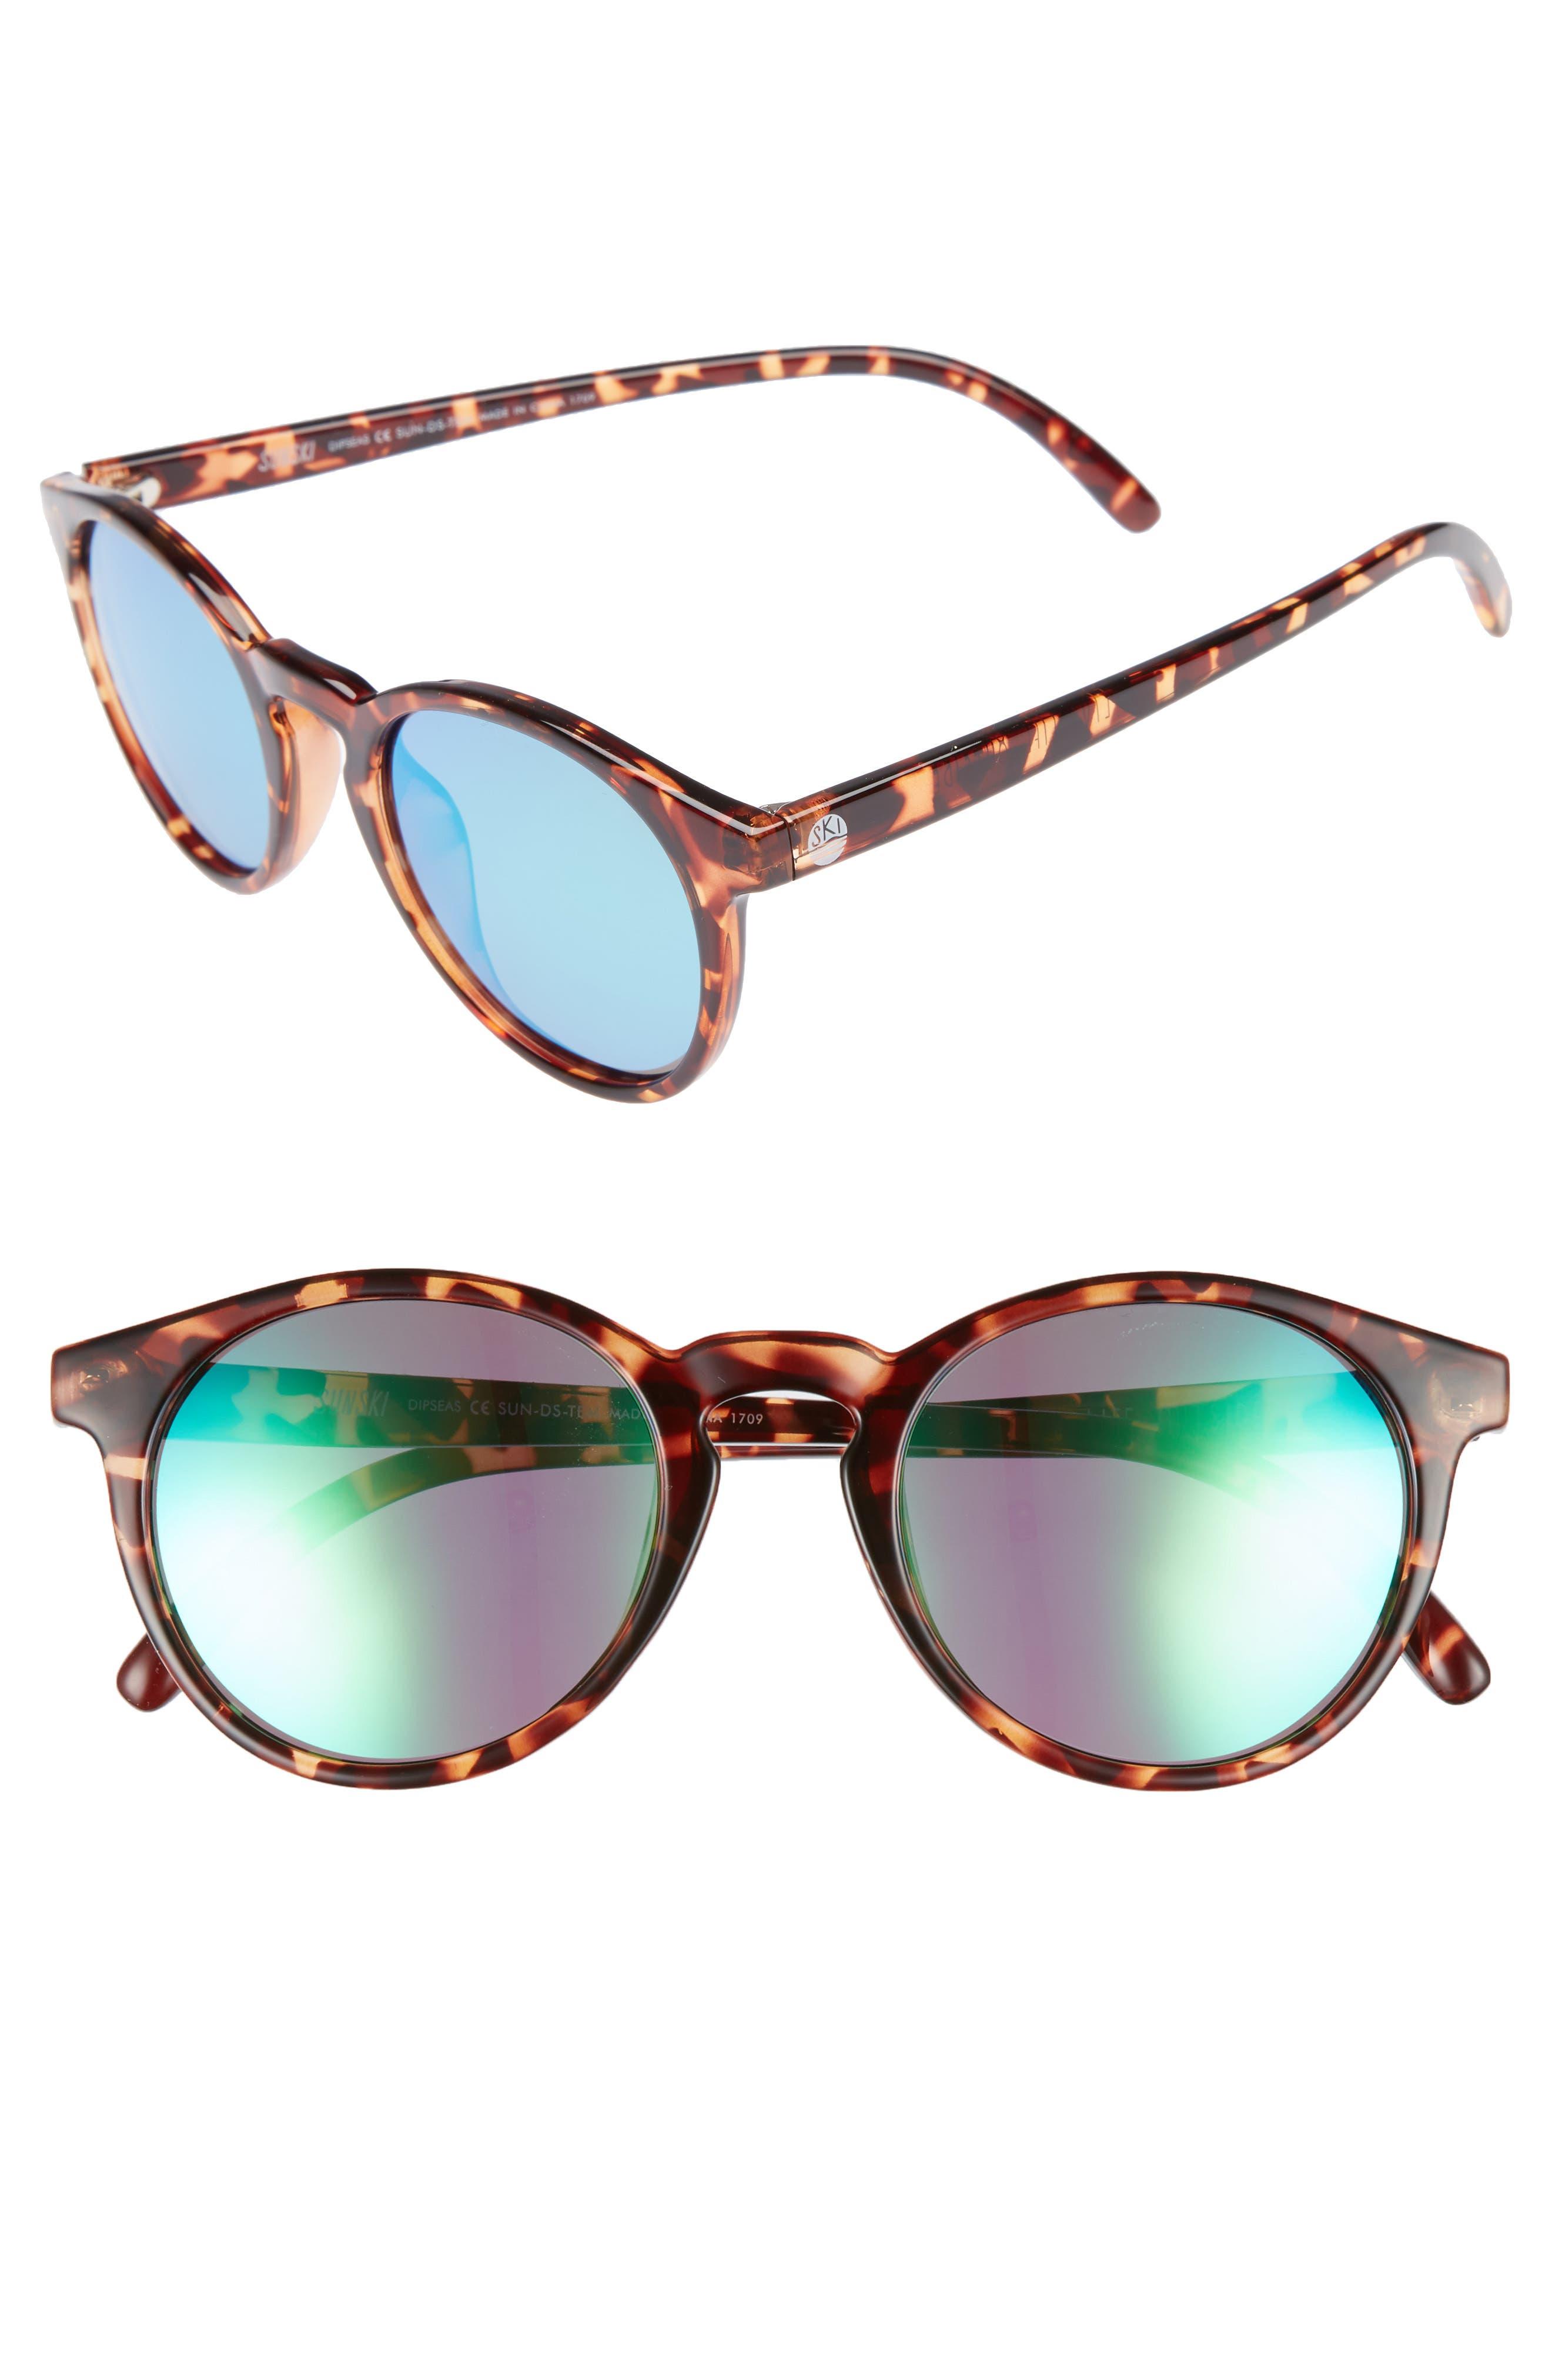 Dipsea 48mm Polarized Sunglasses,                             Alternate thumbnail 2, color,                             TORTOISE EMERALD